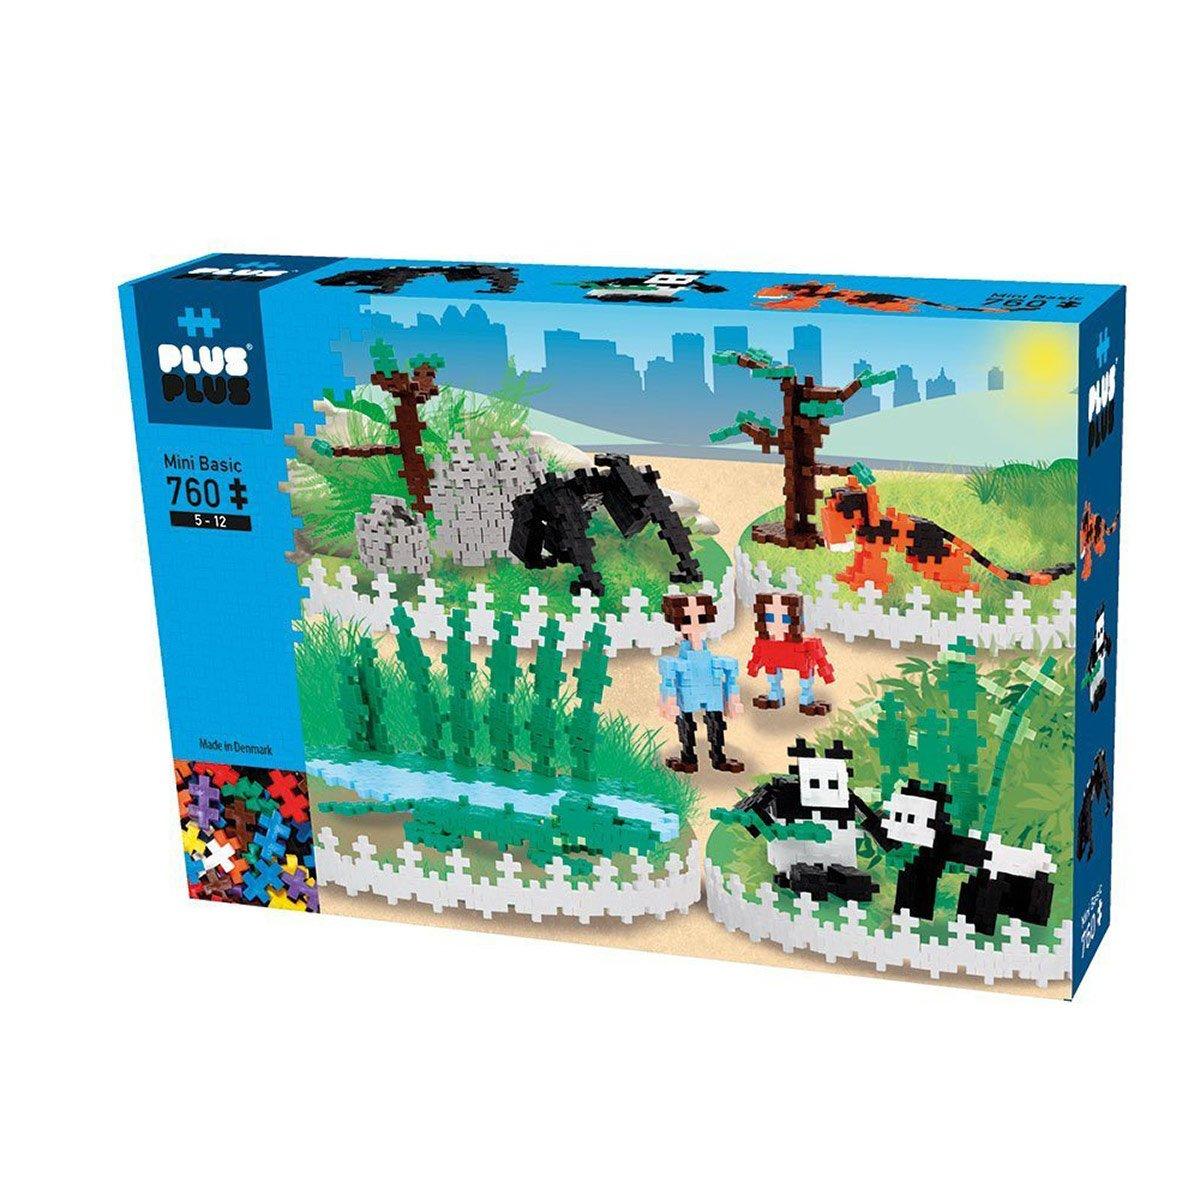 Plus Plus - Mini Basic - Zoo part 2, 760 pc (3763)